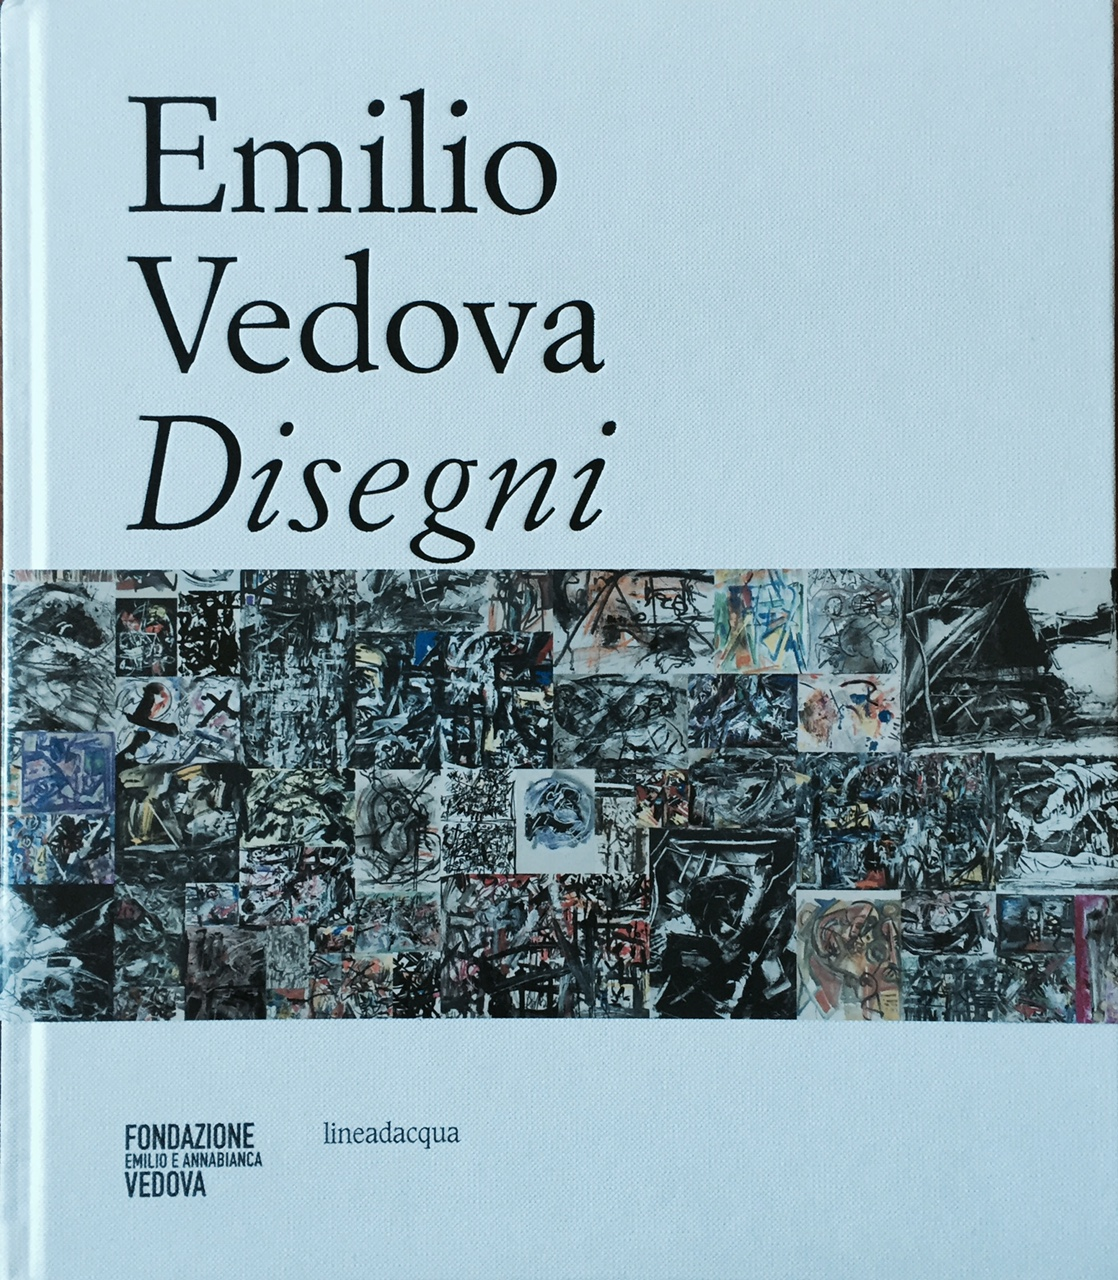 Emilio Vedova - Disegni